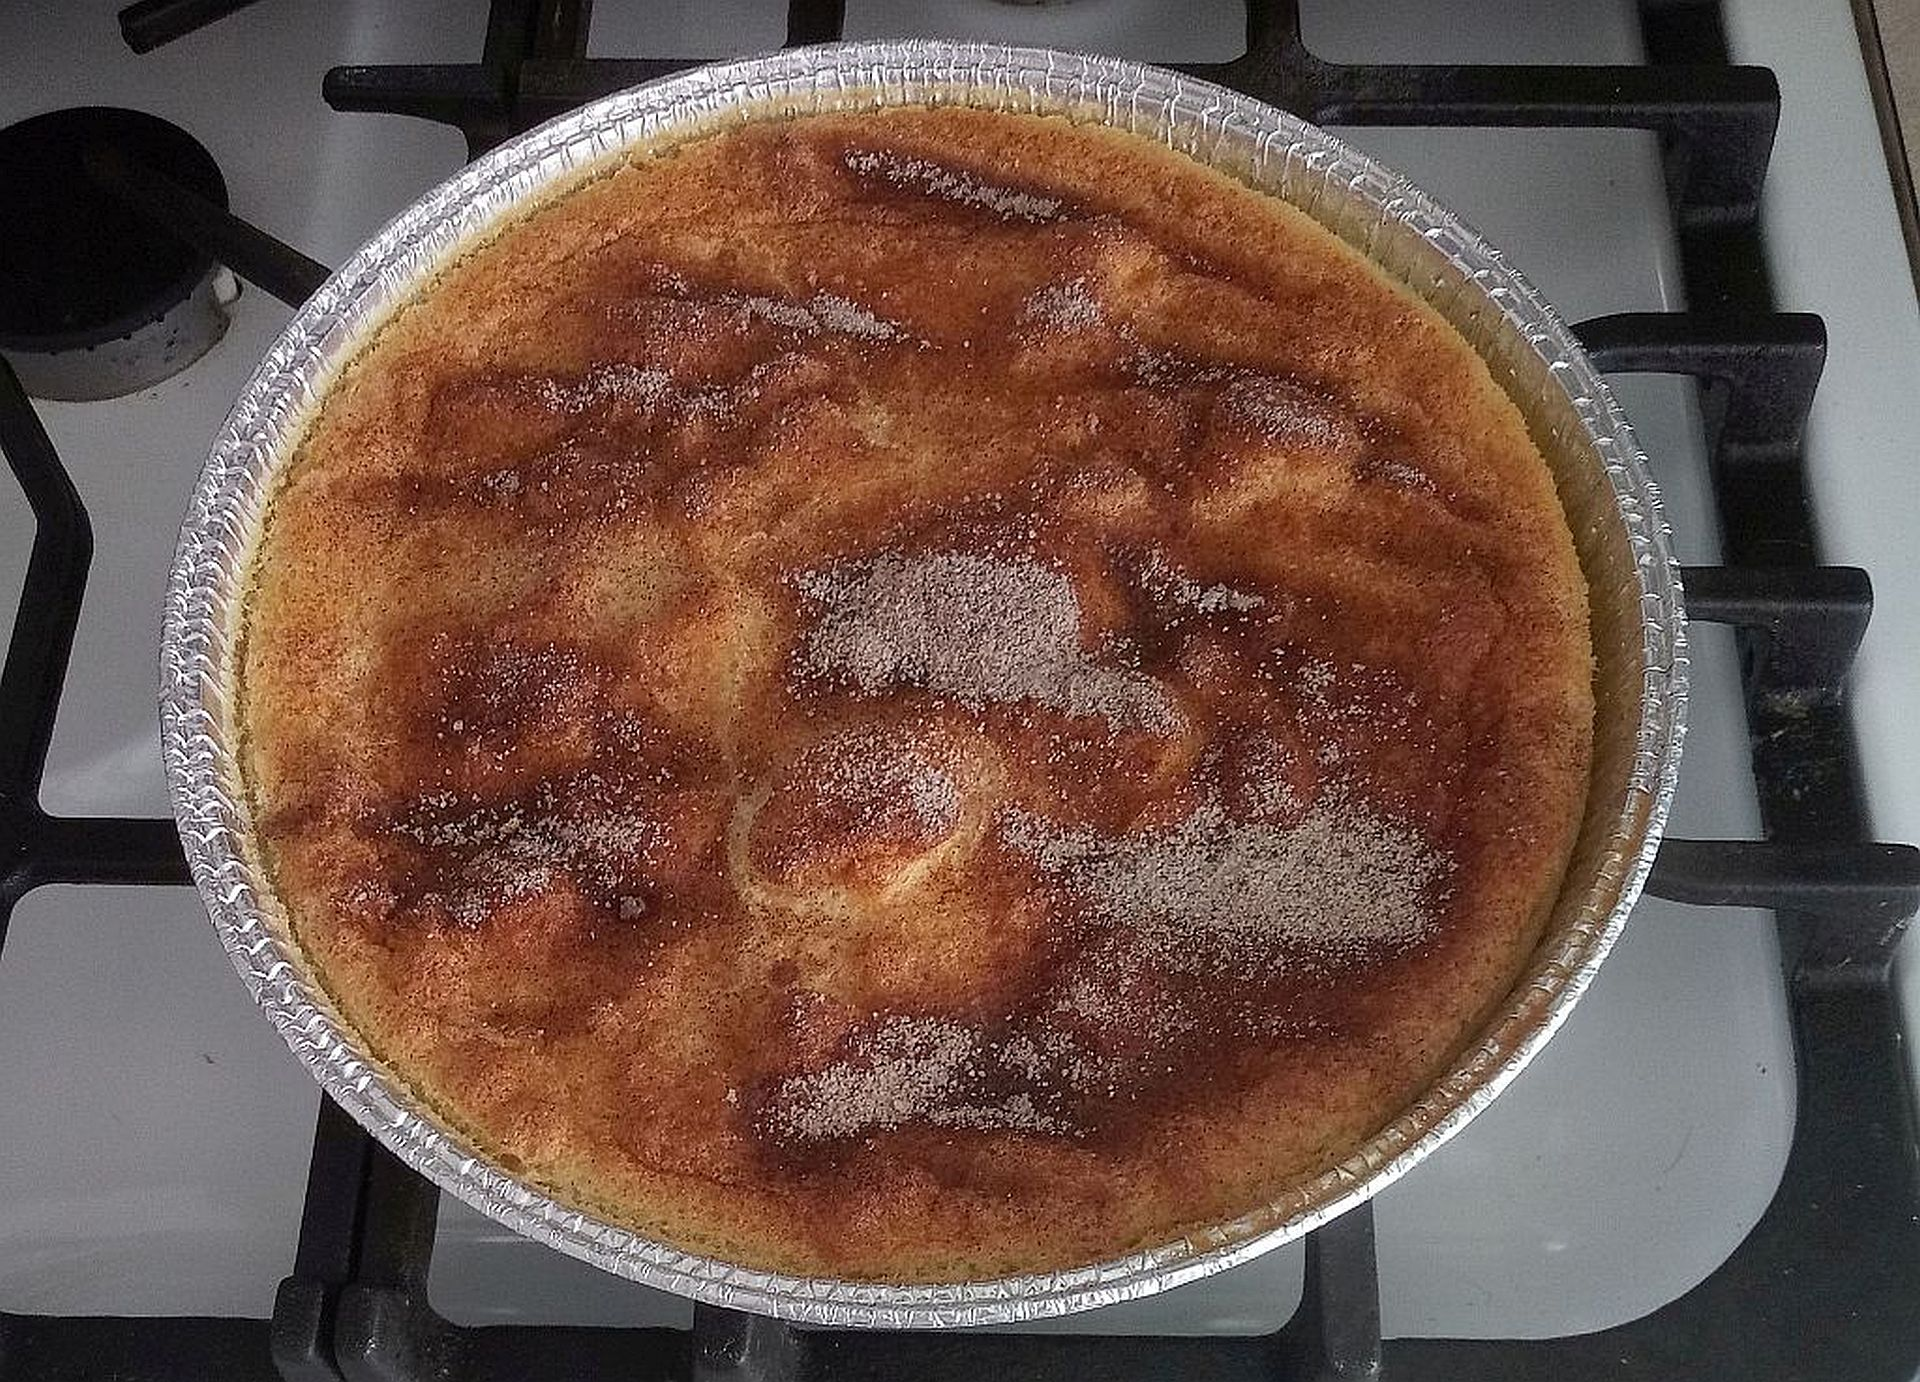 South African Melktert (Milk Tart)